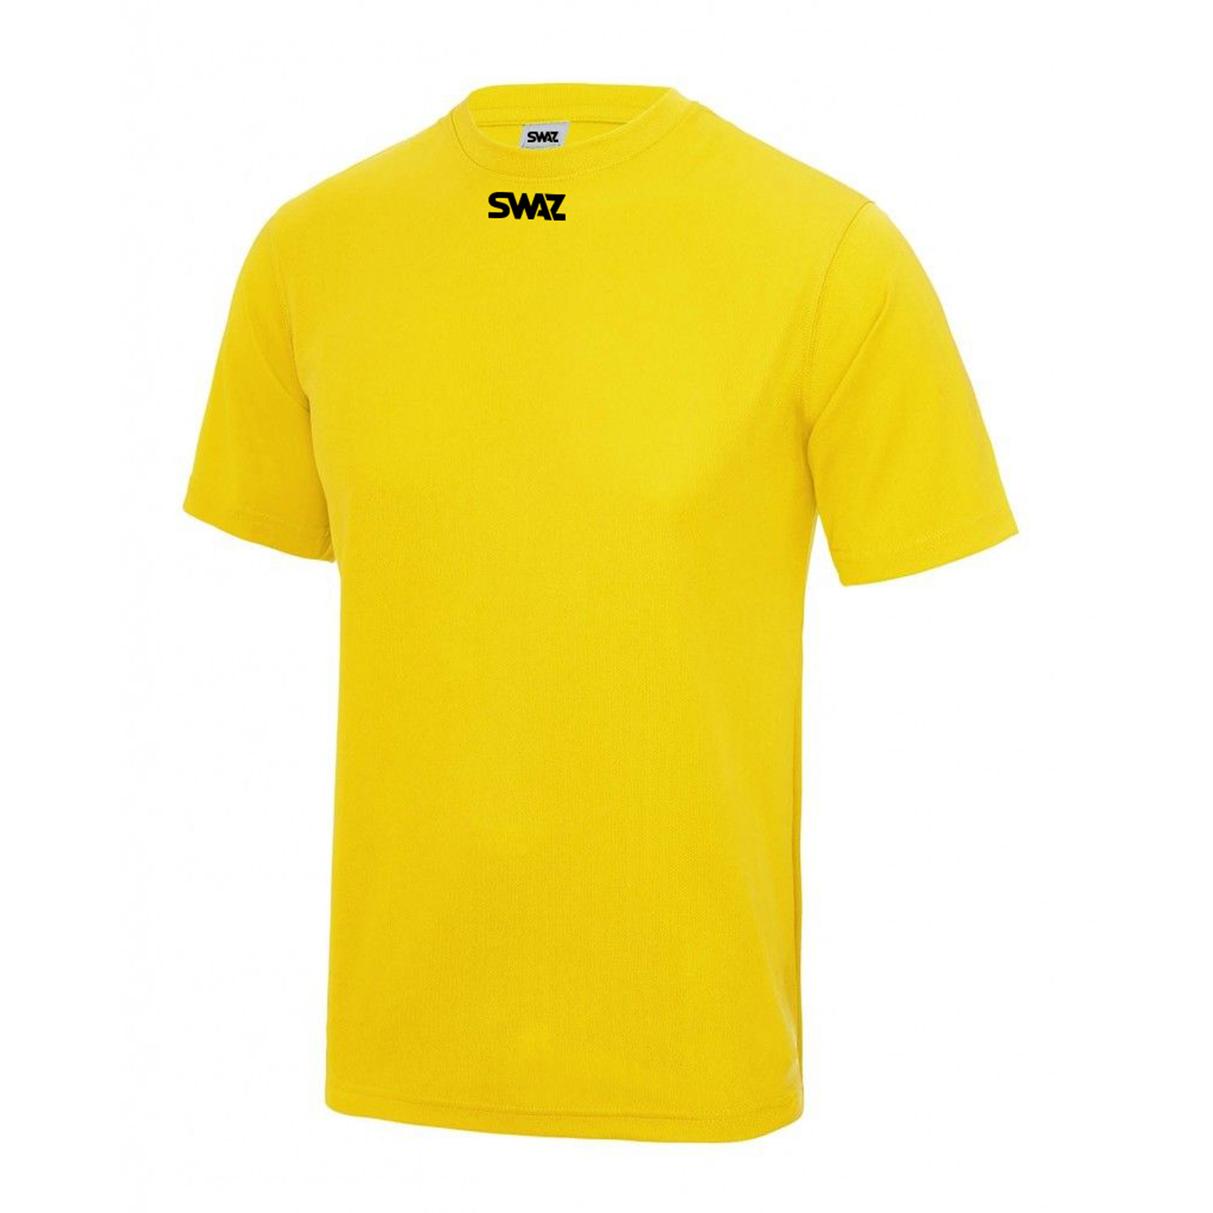 SWAZ Club Training T-Shirt – Yellow